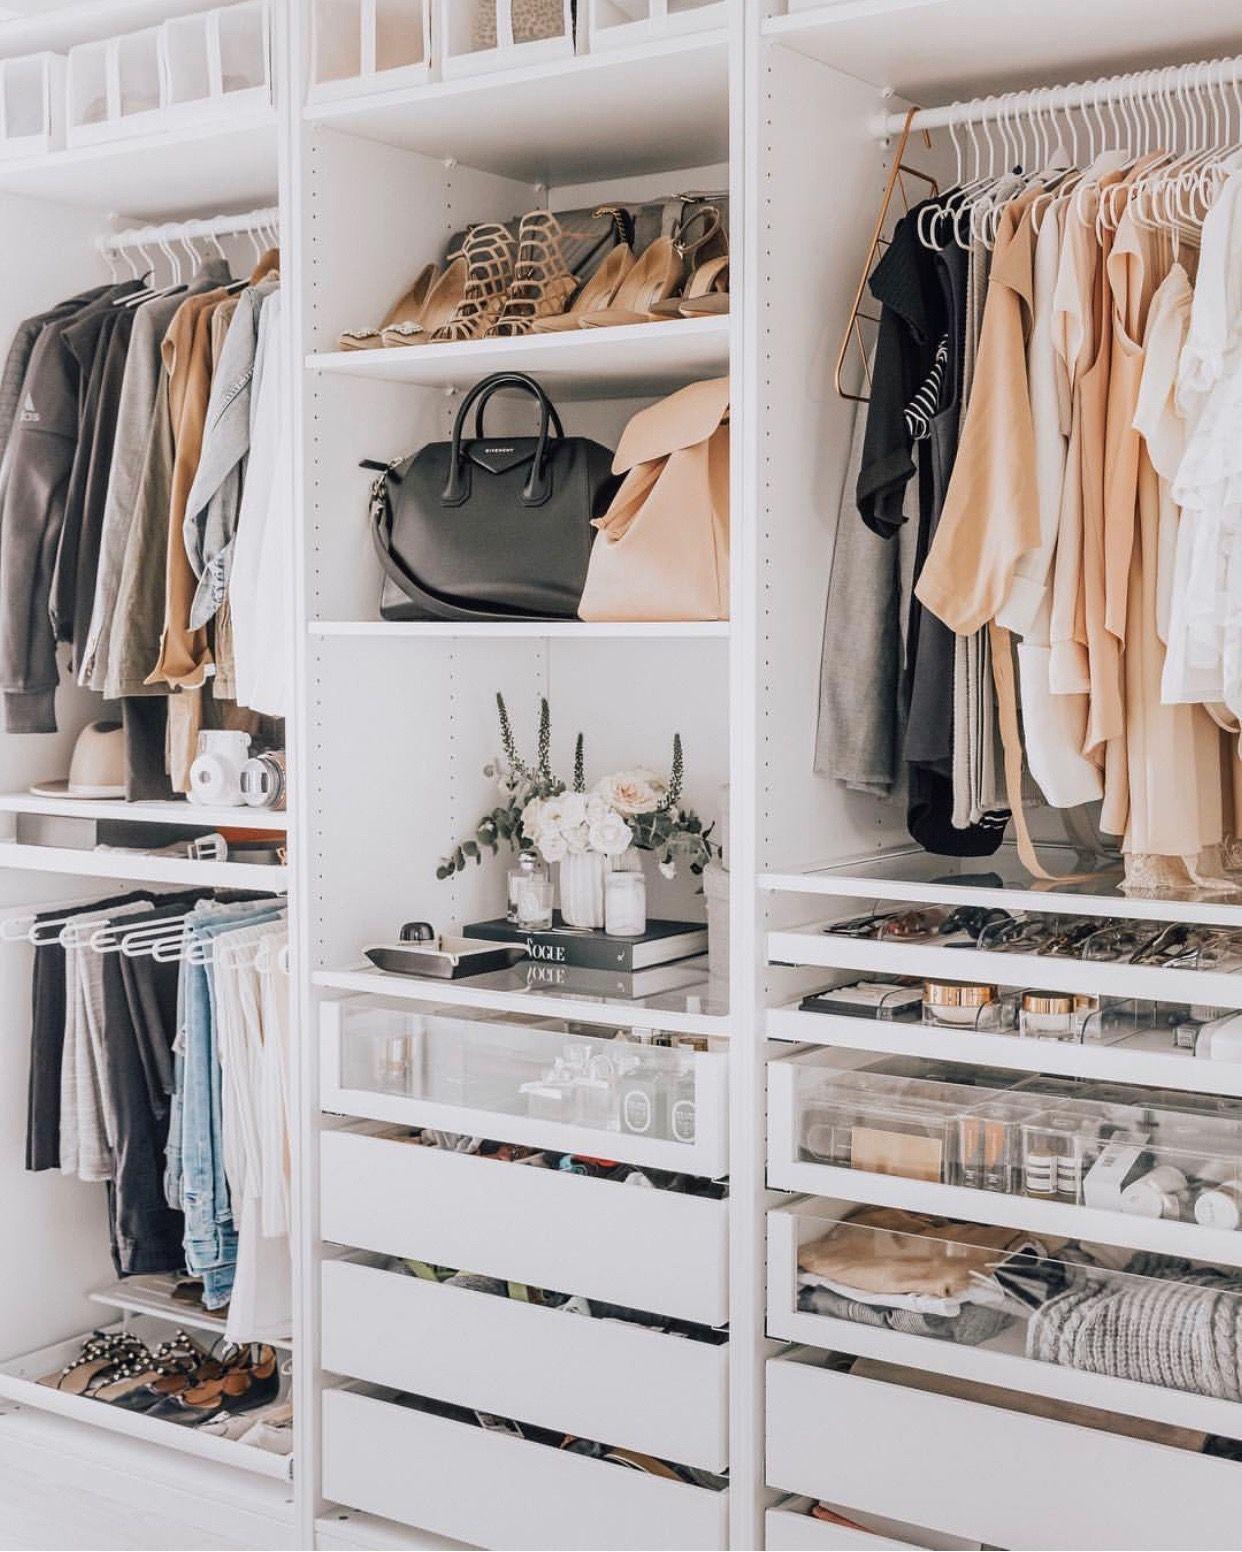 Mein begehbarer Kleiderschrank -  Ganz unten Schuhauszug (wo Türscharniere im Weg sind) The Effective Pictures We Offer You About de -